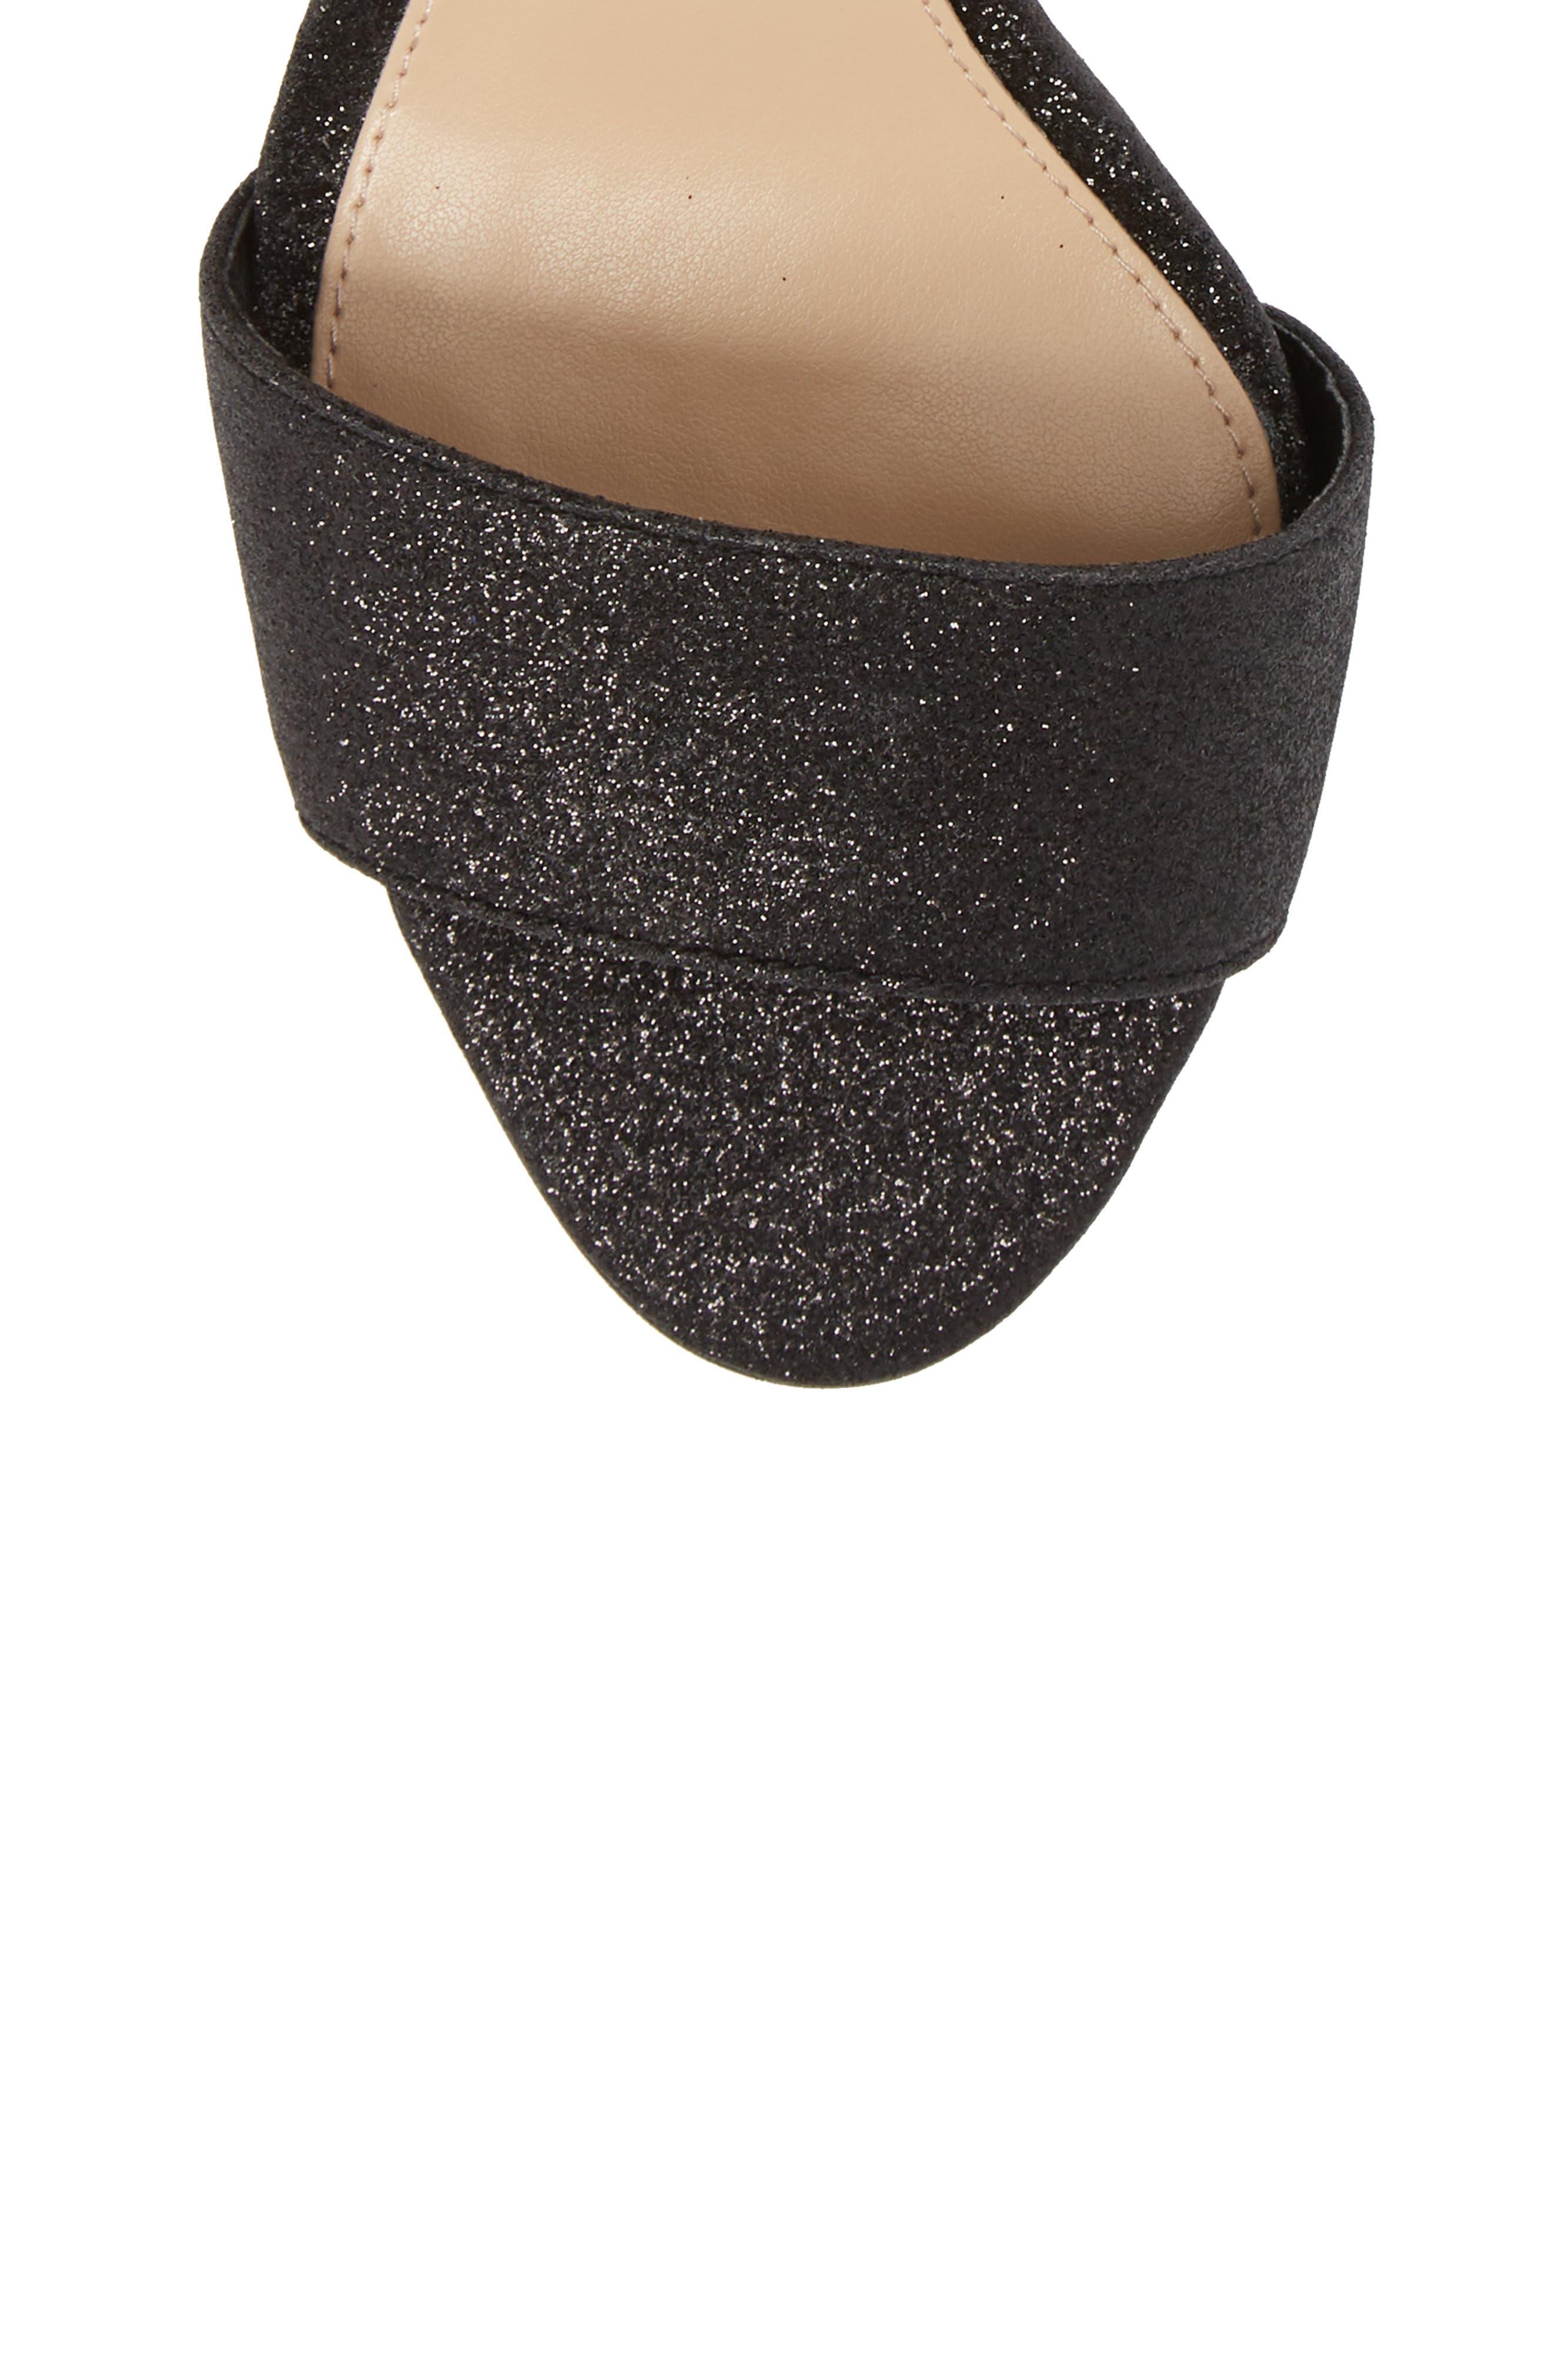 Corlina Ankle Strap Sandal,                             Alternate thumbnail 5, color,                             Black Glitter Fabric